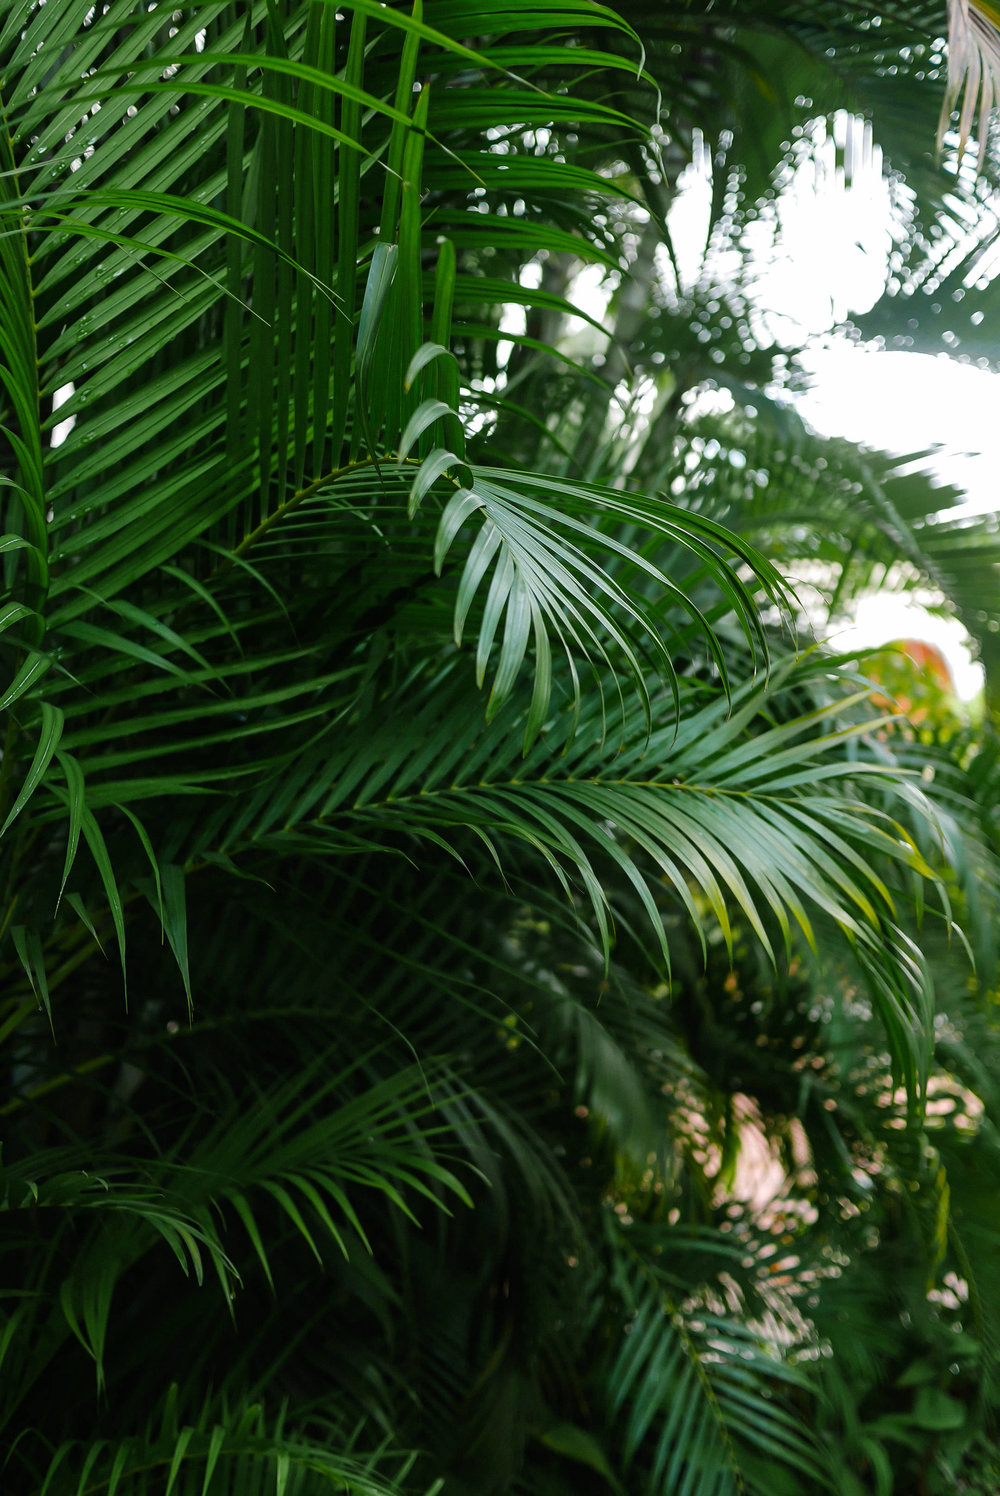 MYBELONGING-TOMMYLEI-DOMINICAN-REPUBLIC-UNESCO-SANTO-DOMINGO-TRAVEL-PHOTOGRAPHY-63.jpg